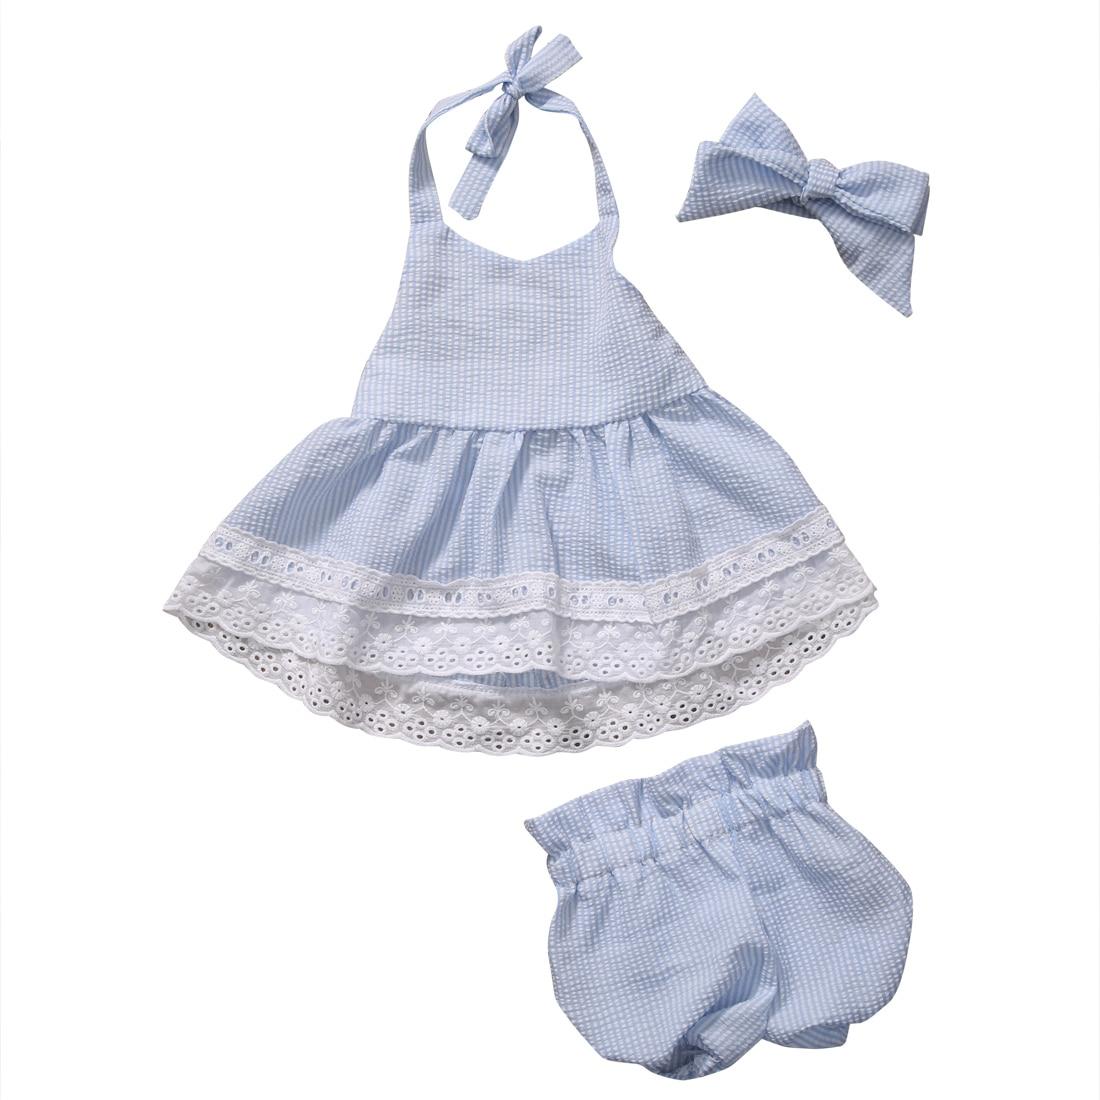 2018 New Fashion Baby Clothes Sets Newborn Kids Baby Girls Bowknot Striped Halter Tops Lace Dress Shorts Pants Headband 3Pcs Set